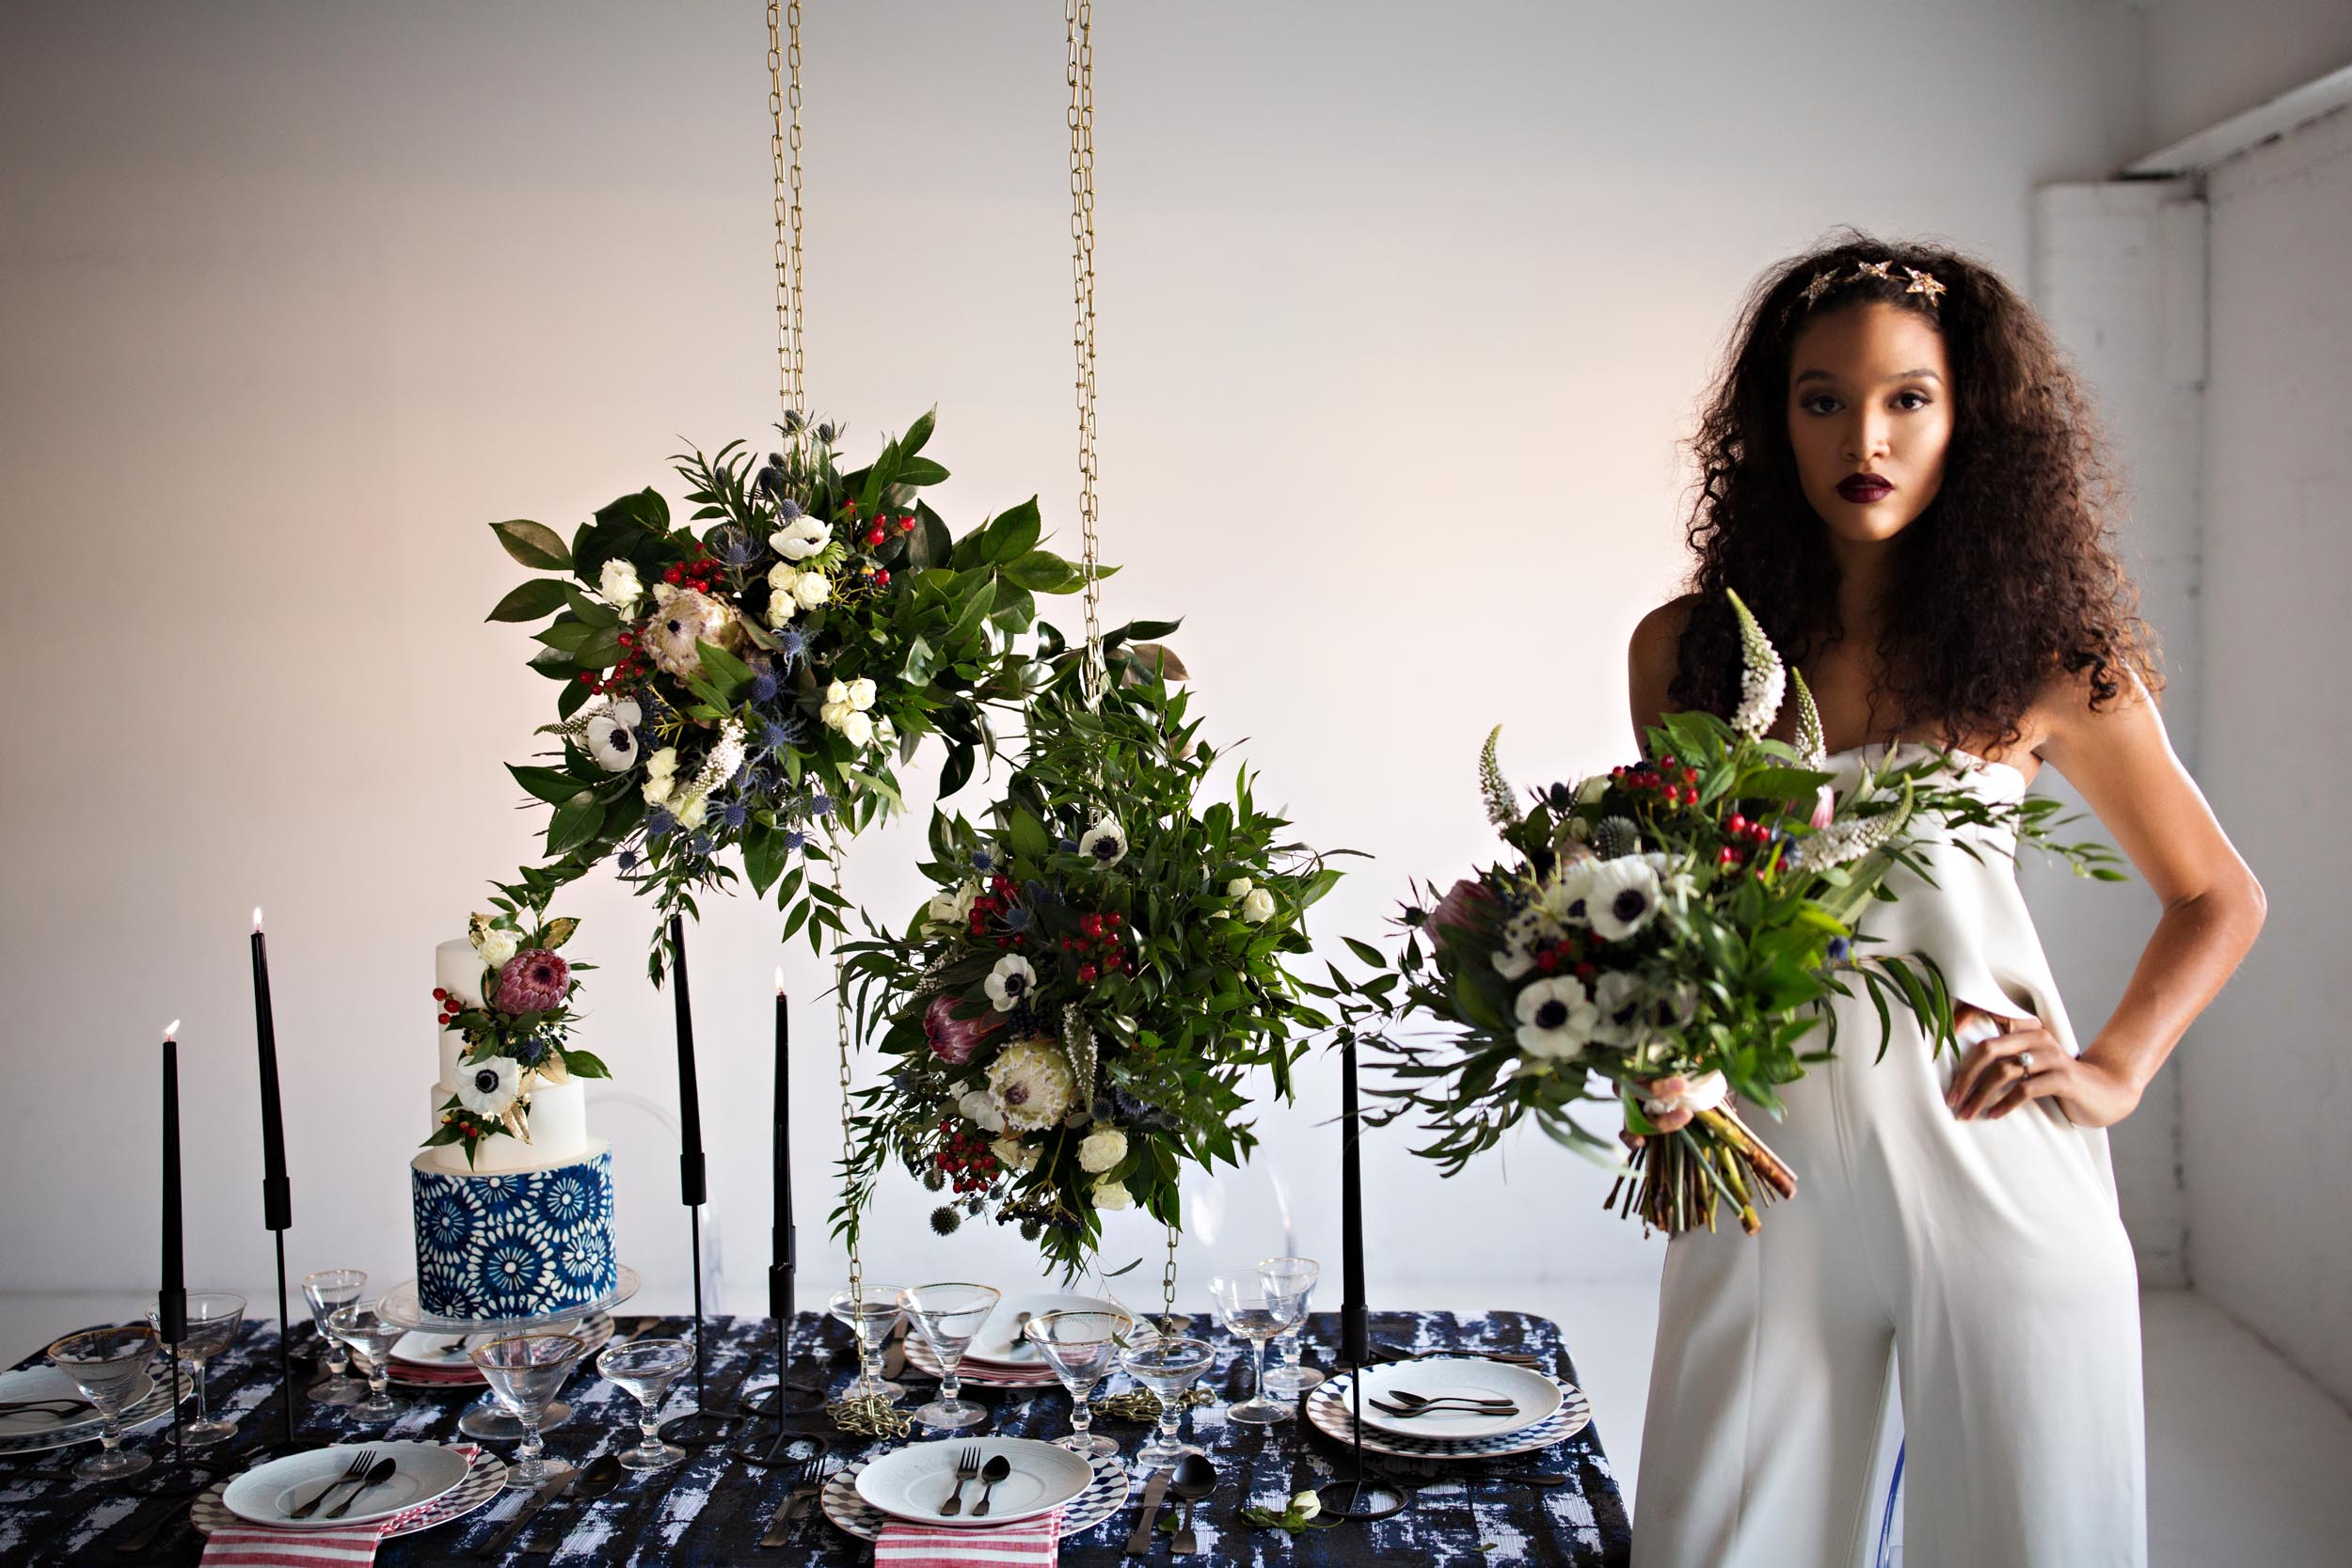 weddings-starsstripes-24.jpg